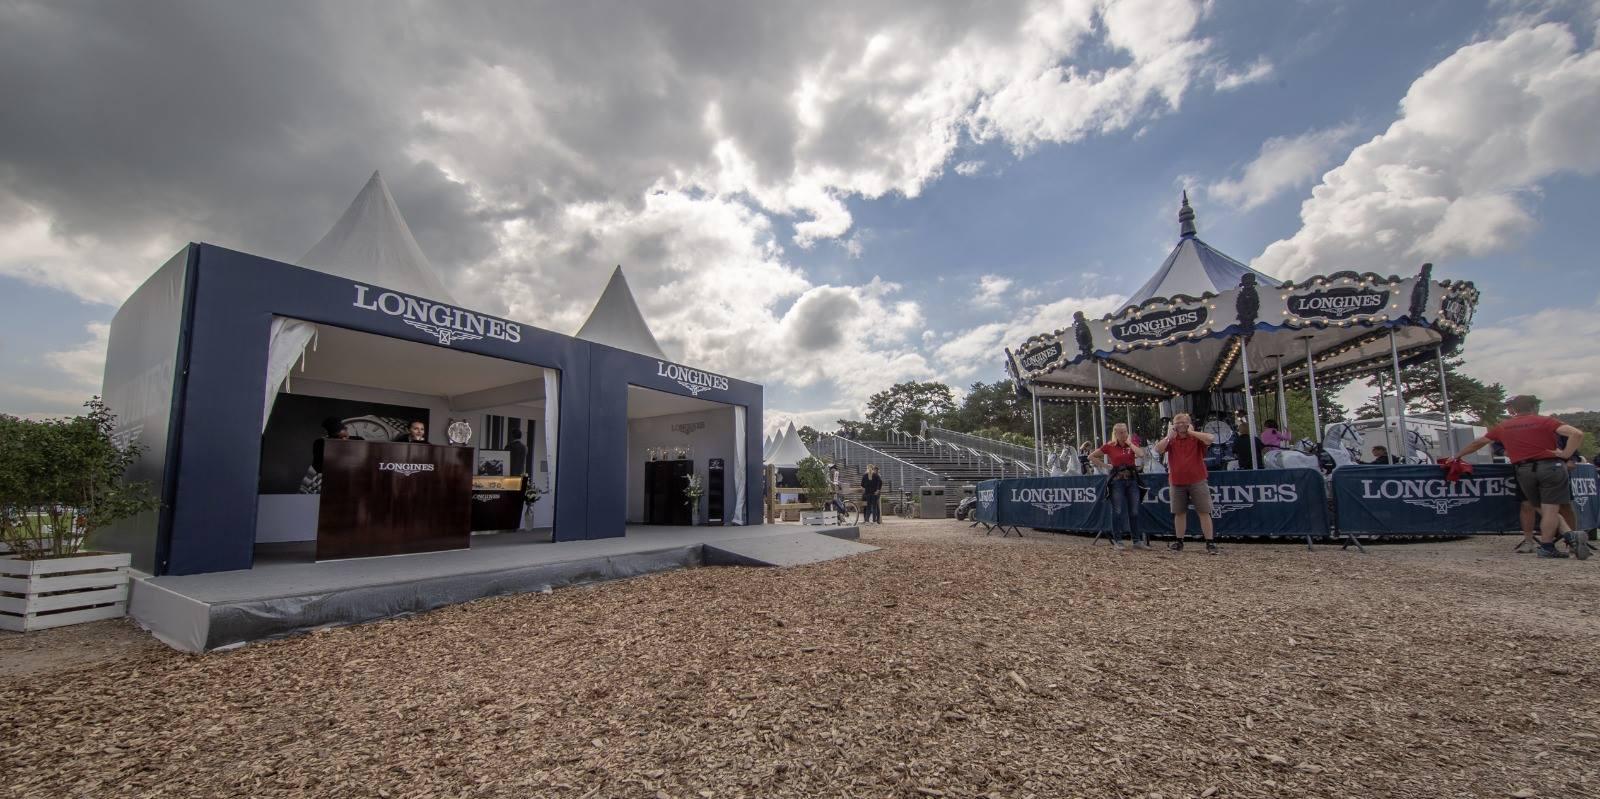 Garden-pagode-evenementiel-tente